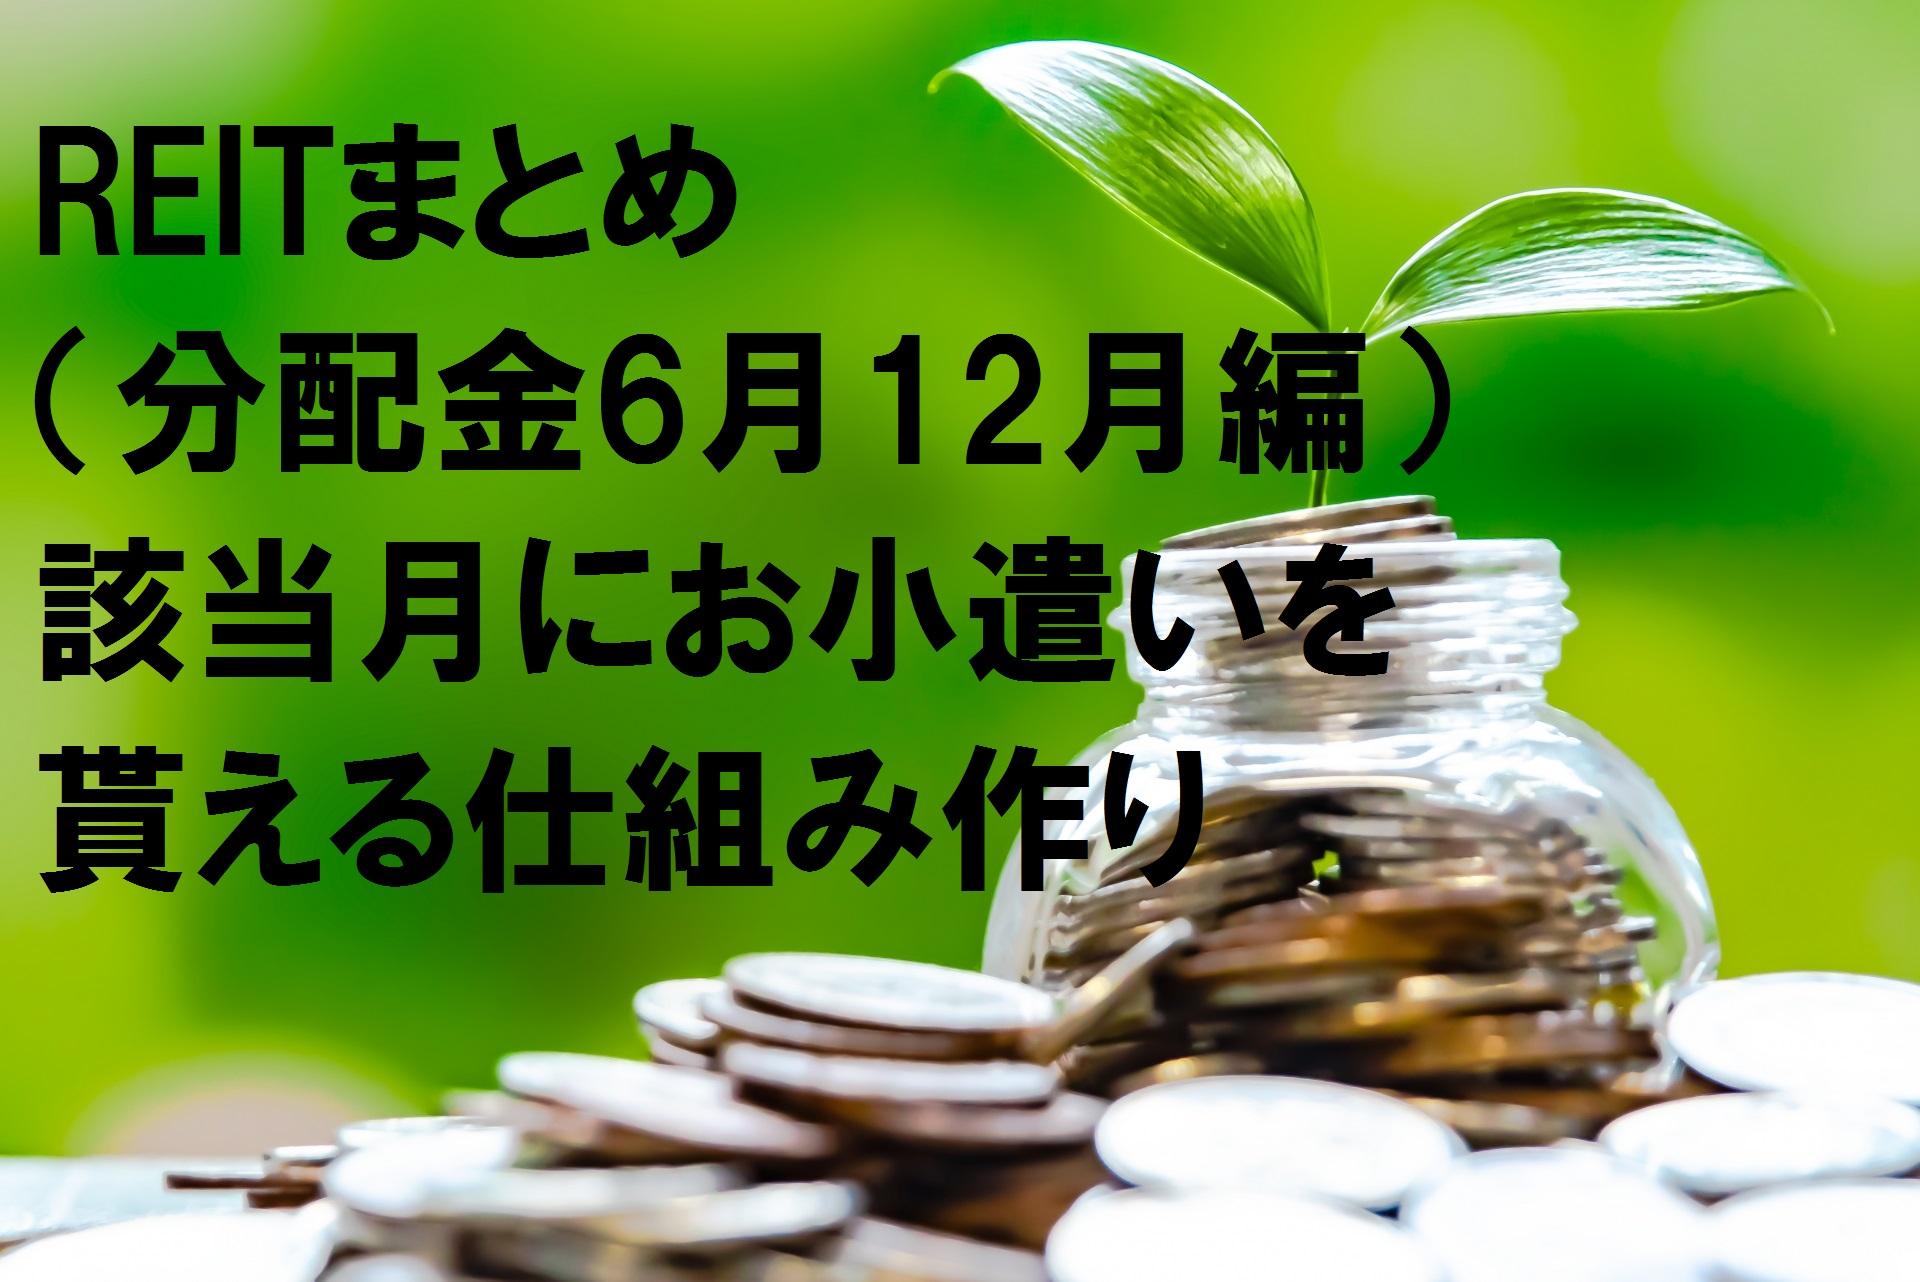 REITまとめ(分配金6月12月編)該当月にお小遣いを貰える仕組み作り